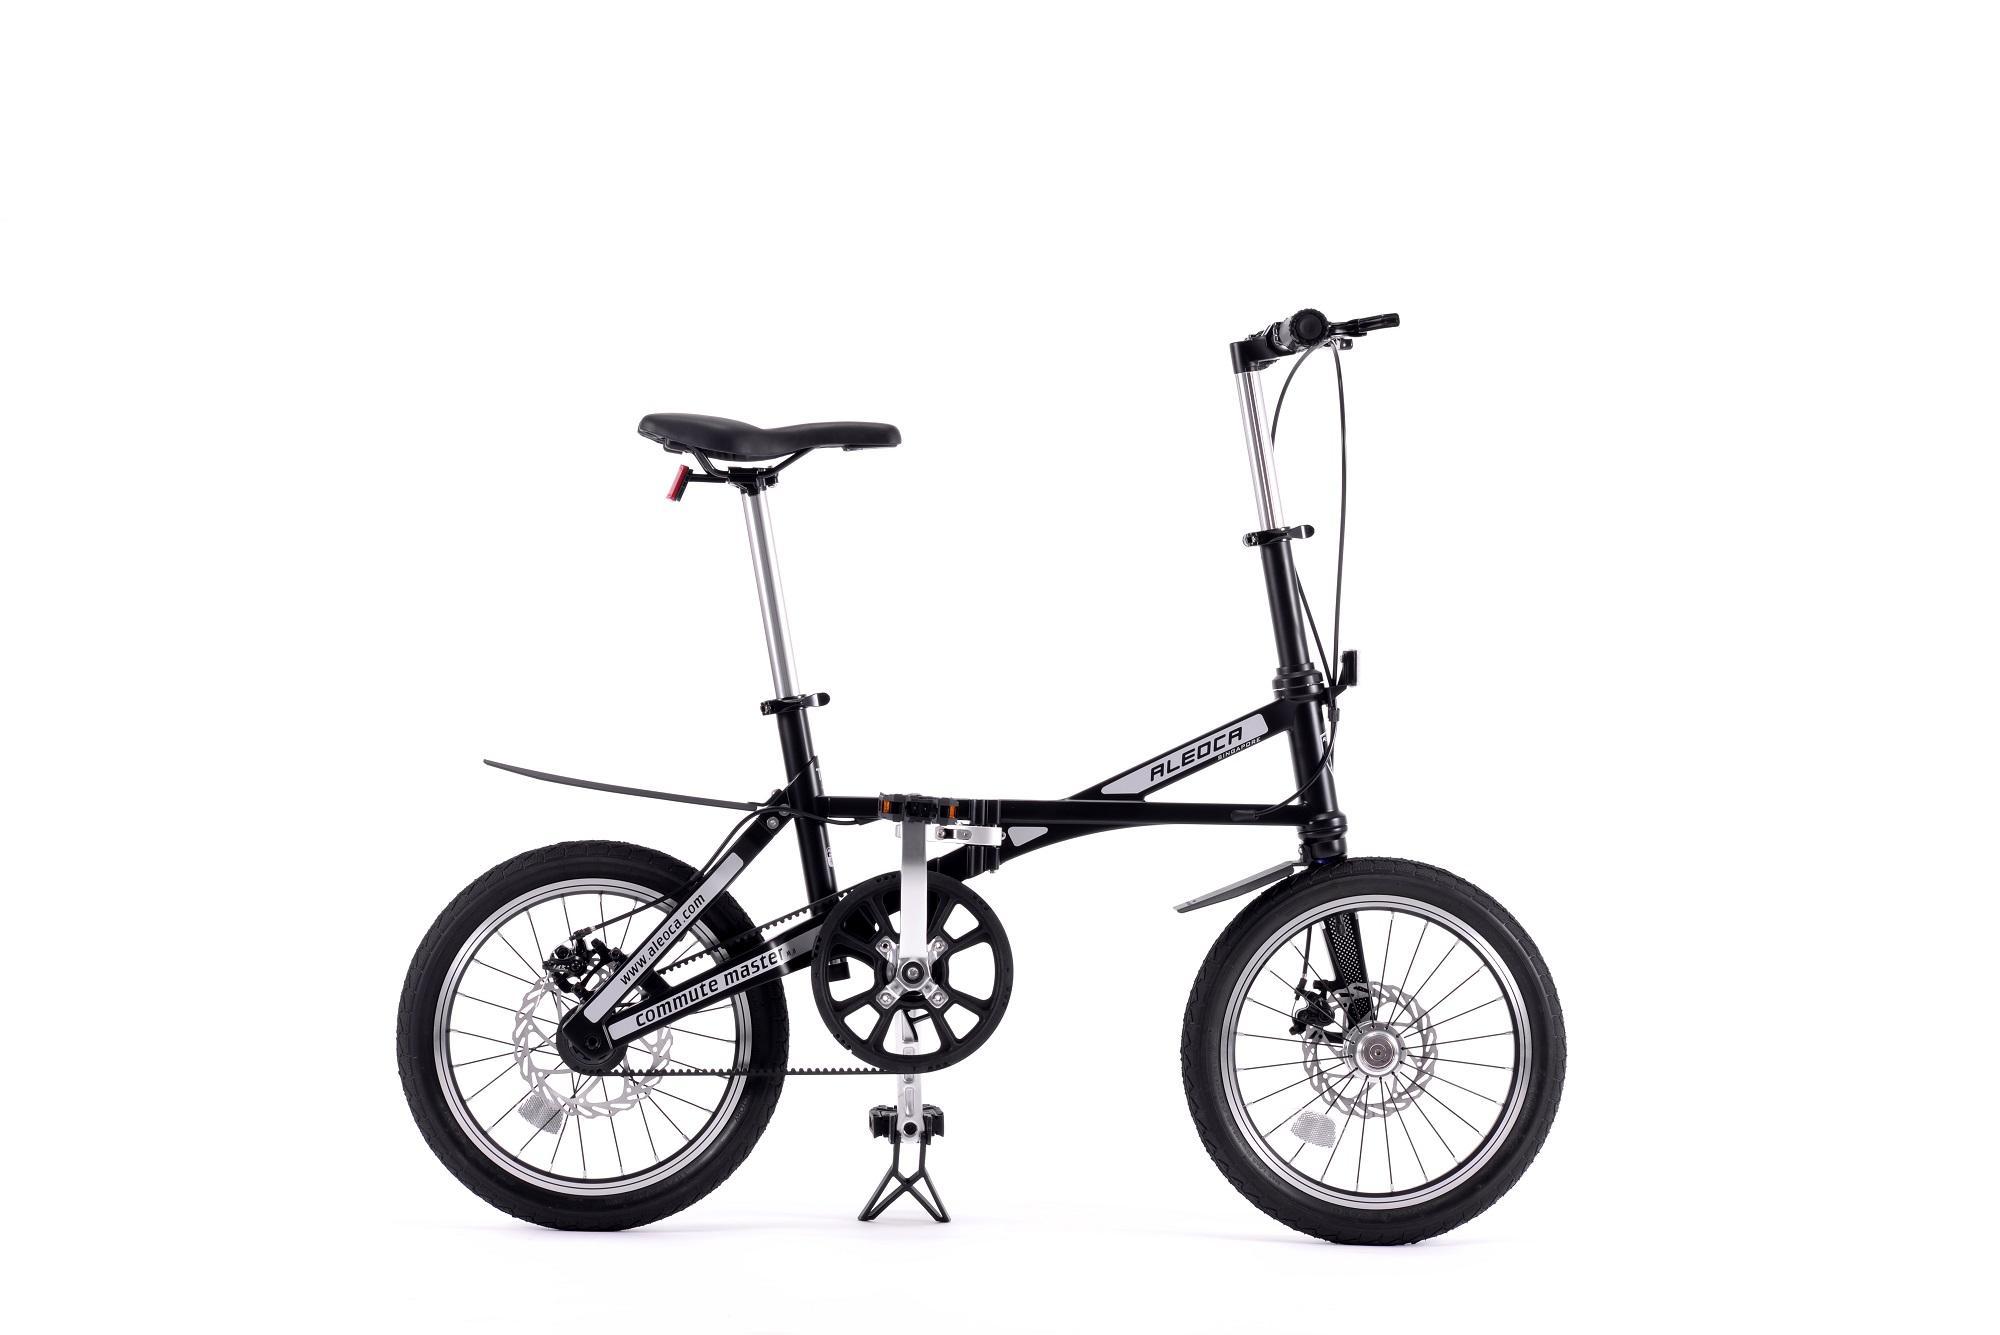 Buy Aleoca Bike Accessories